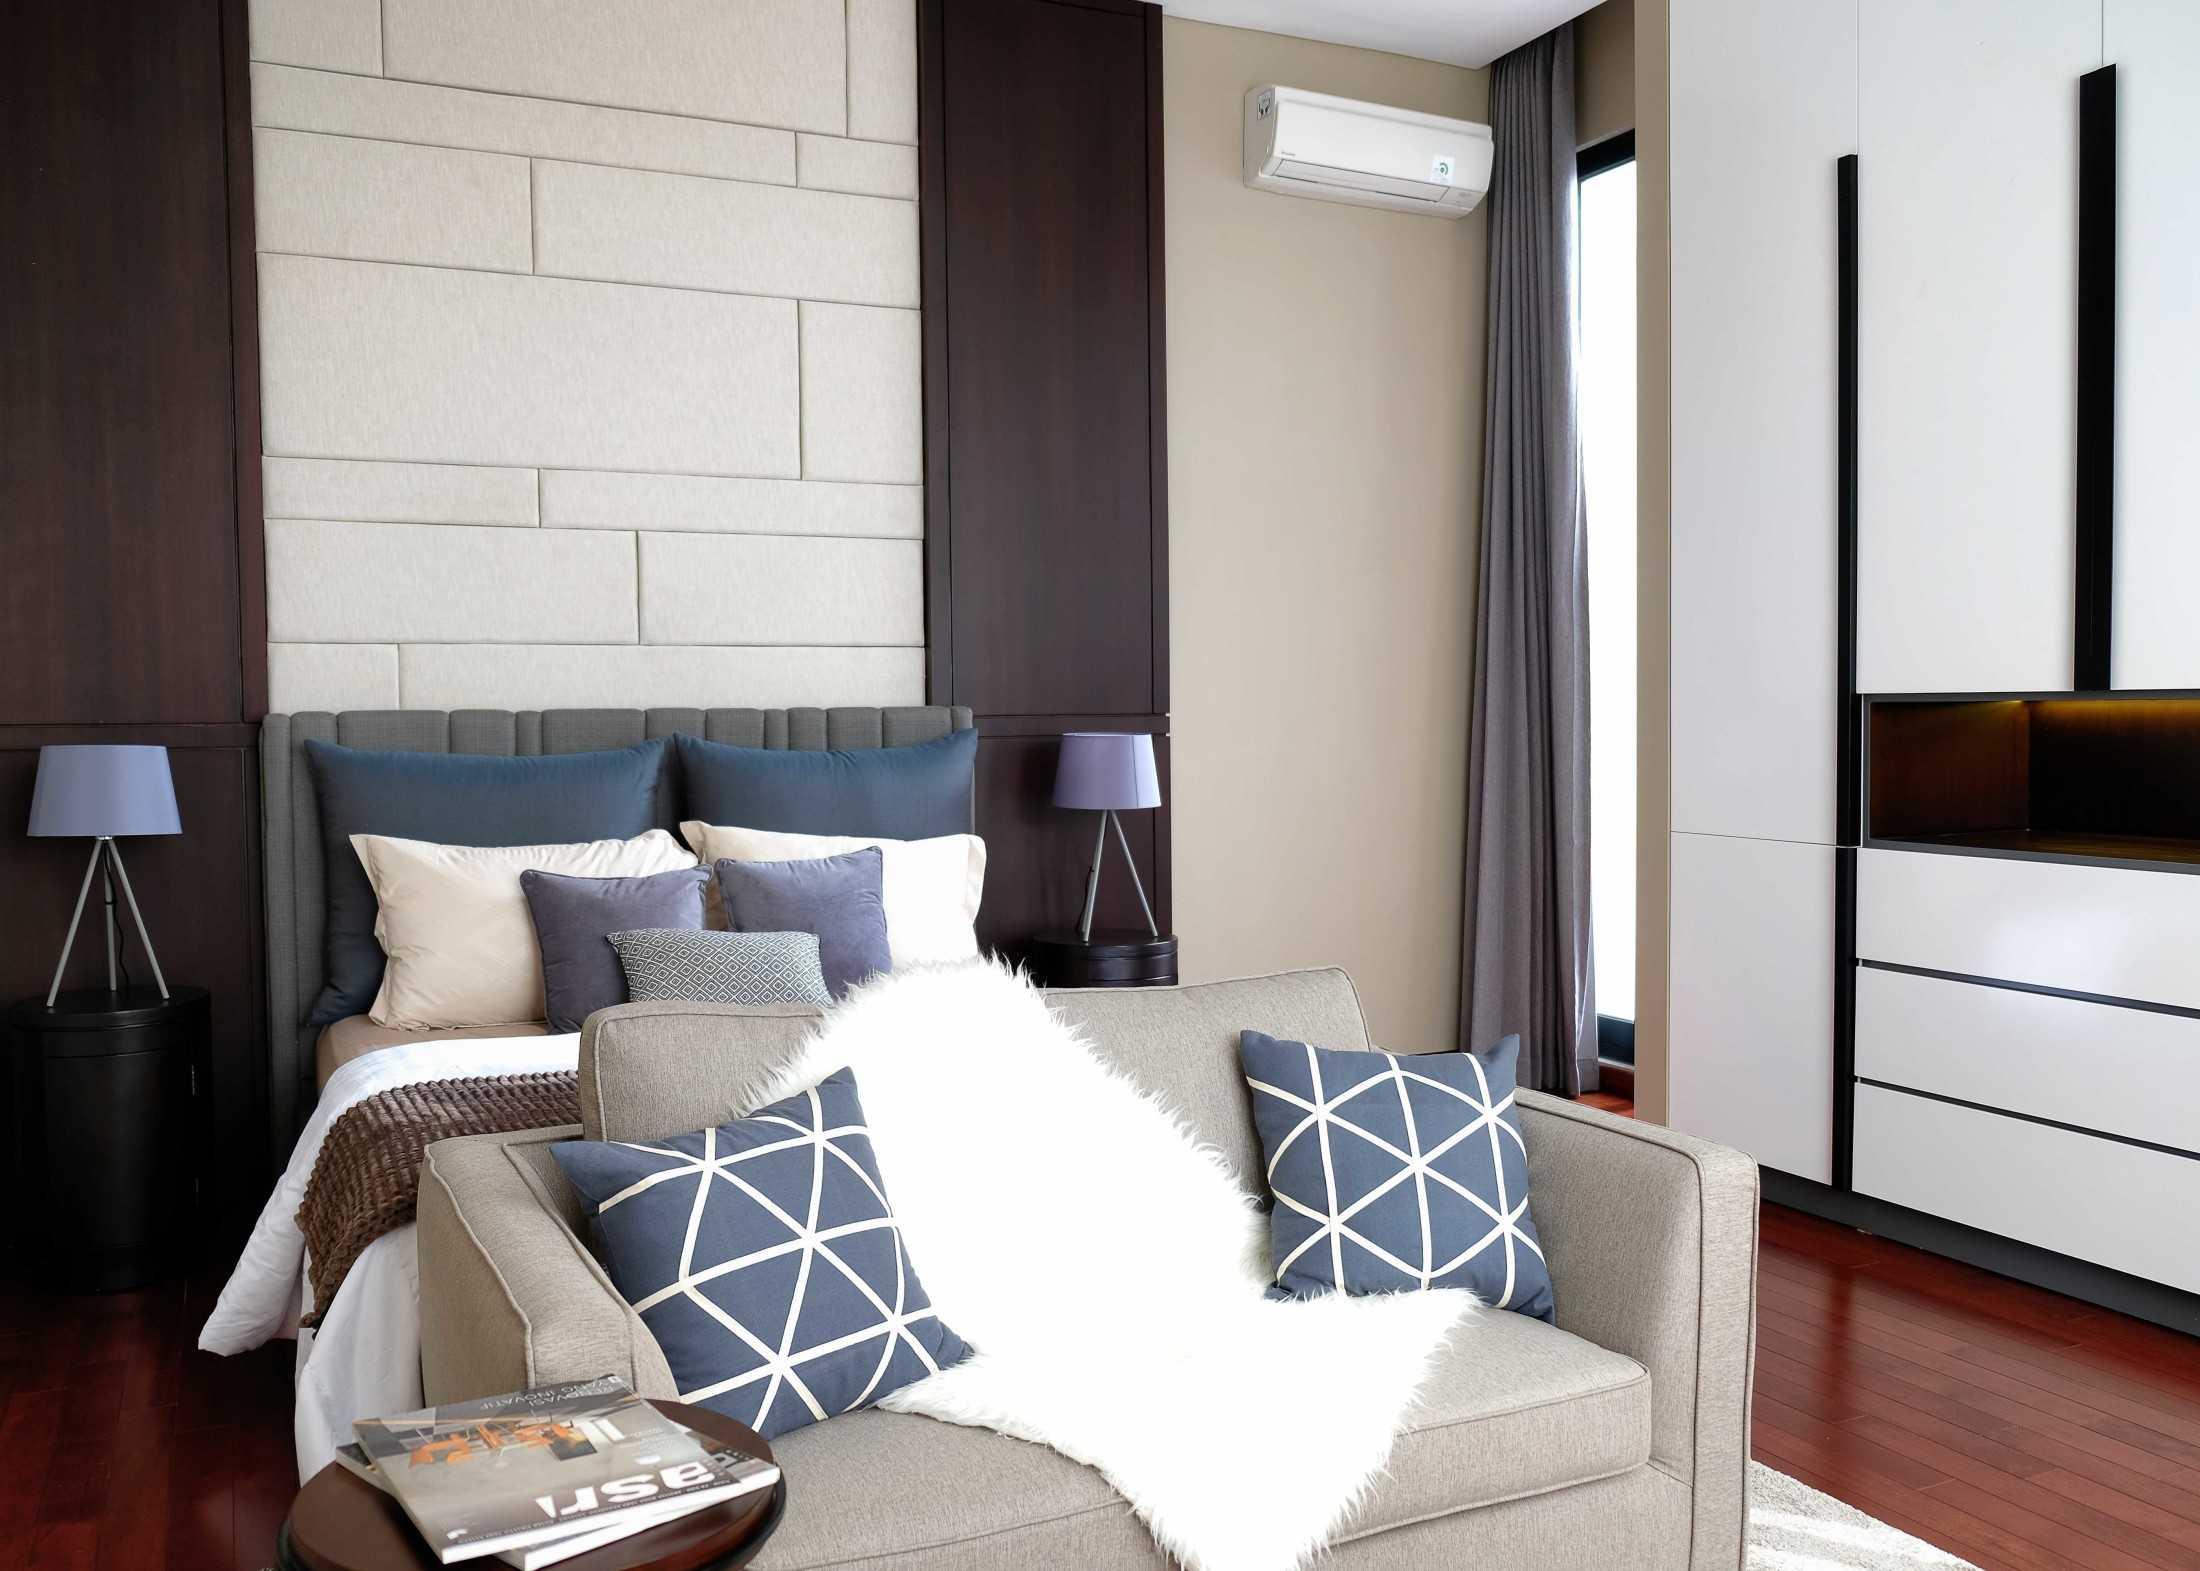 Equil Interior Lv Residence Surabaya, Kota Sby, Jawa Timur, Indonesia Surabaya, Kota Sby, Jawa Timur, Indonesia Equil-Interior-Lv-Residence  62568